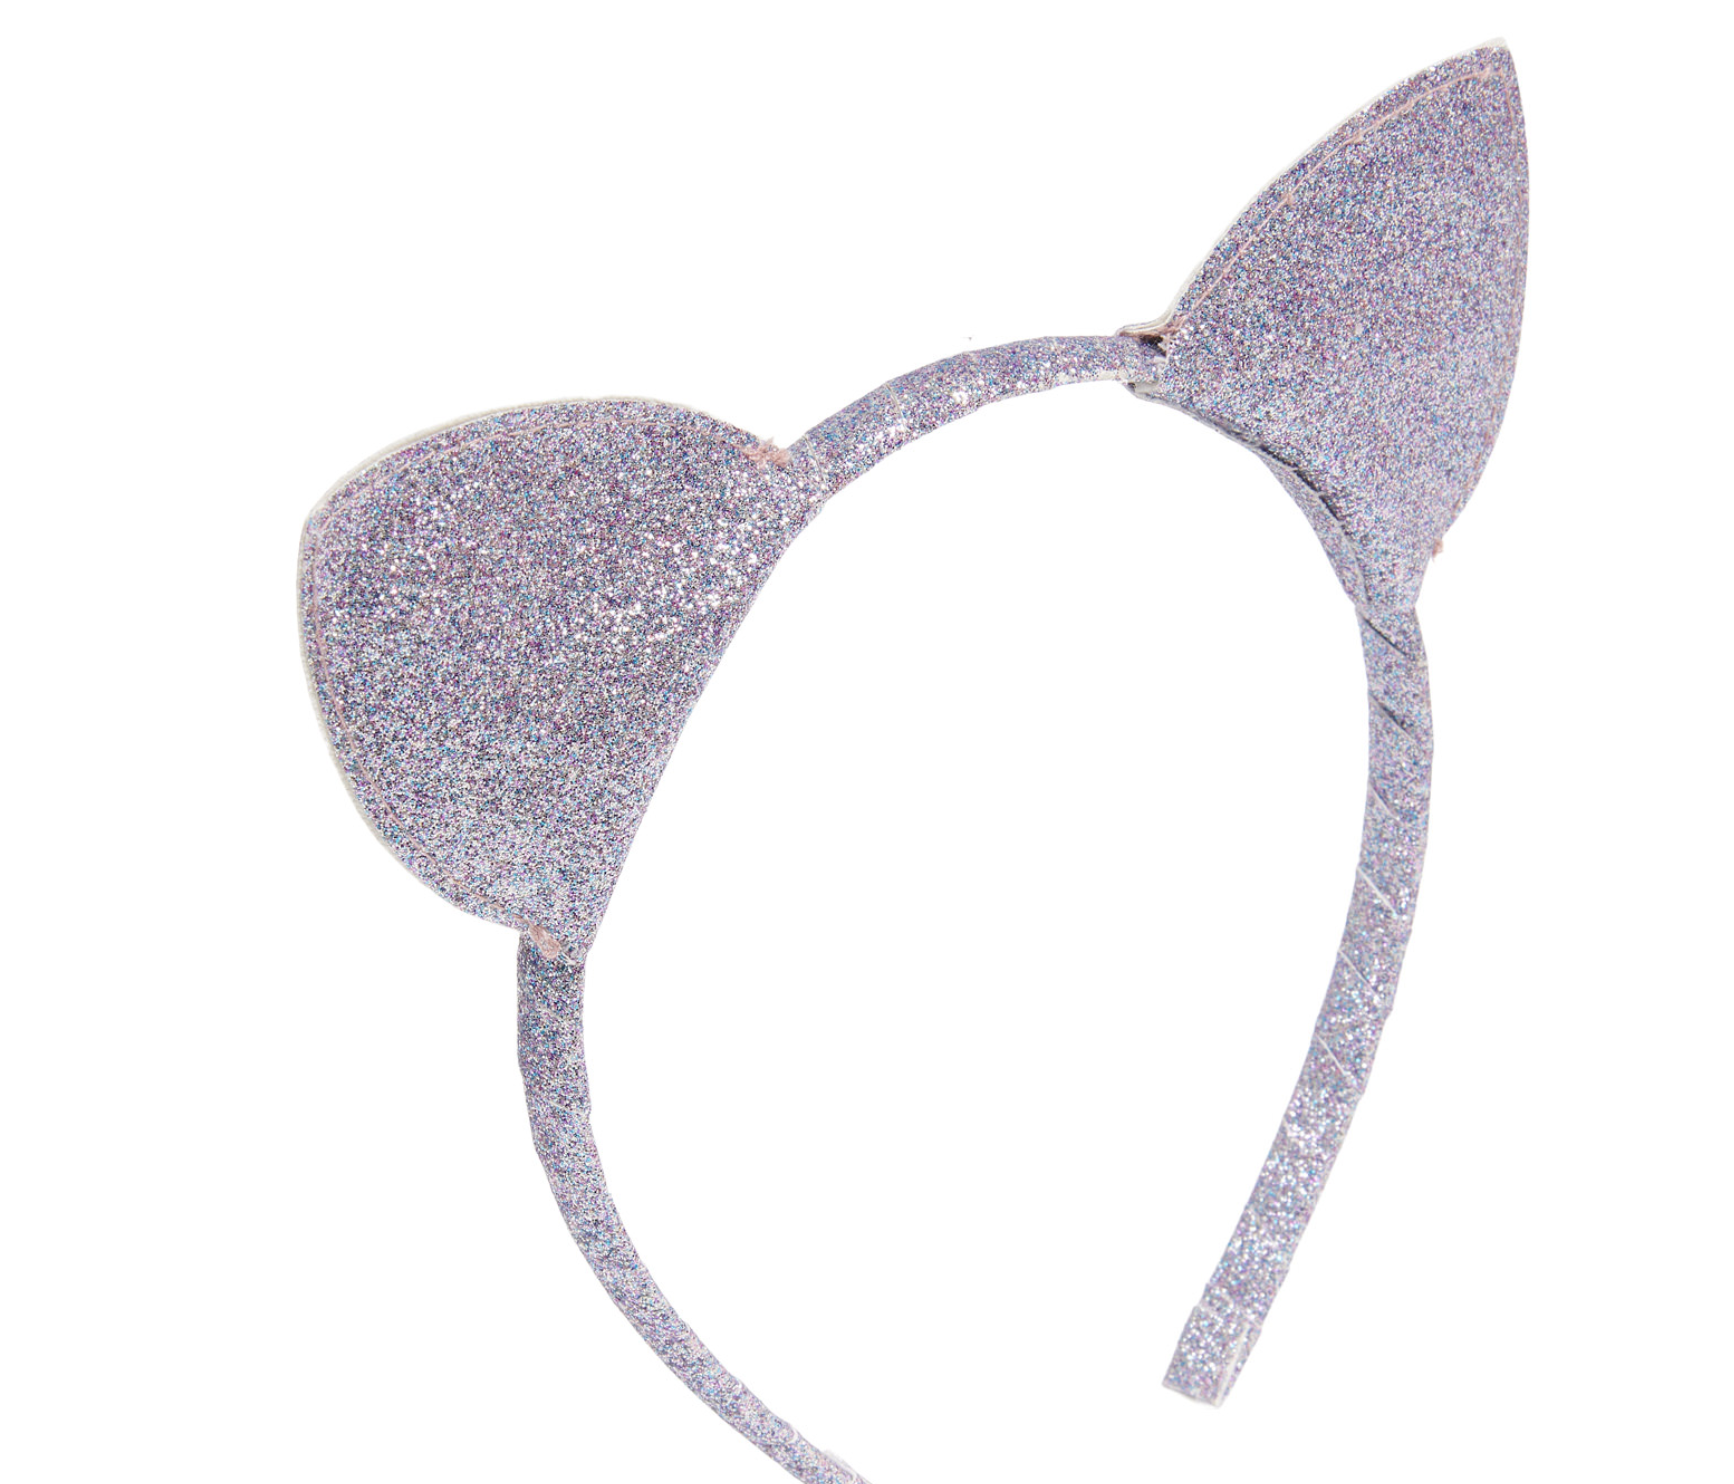 Haarband Glitter Lavendel - LE BIG-1